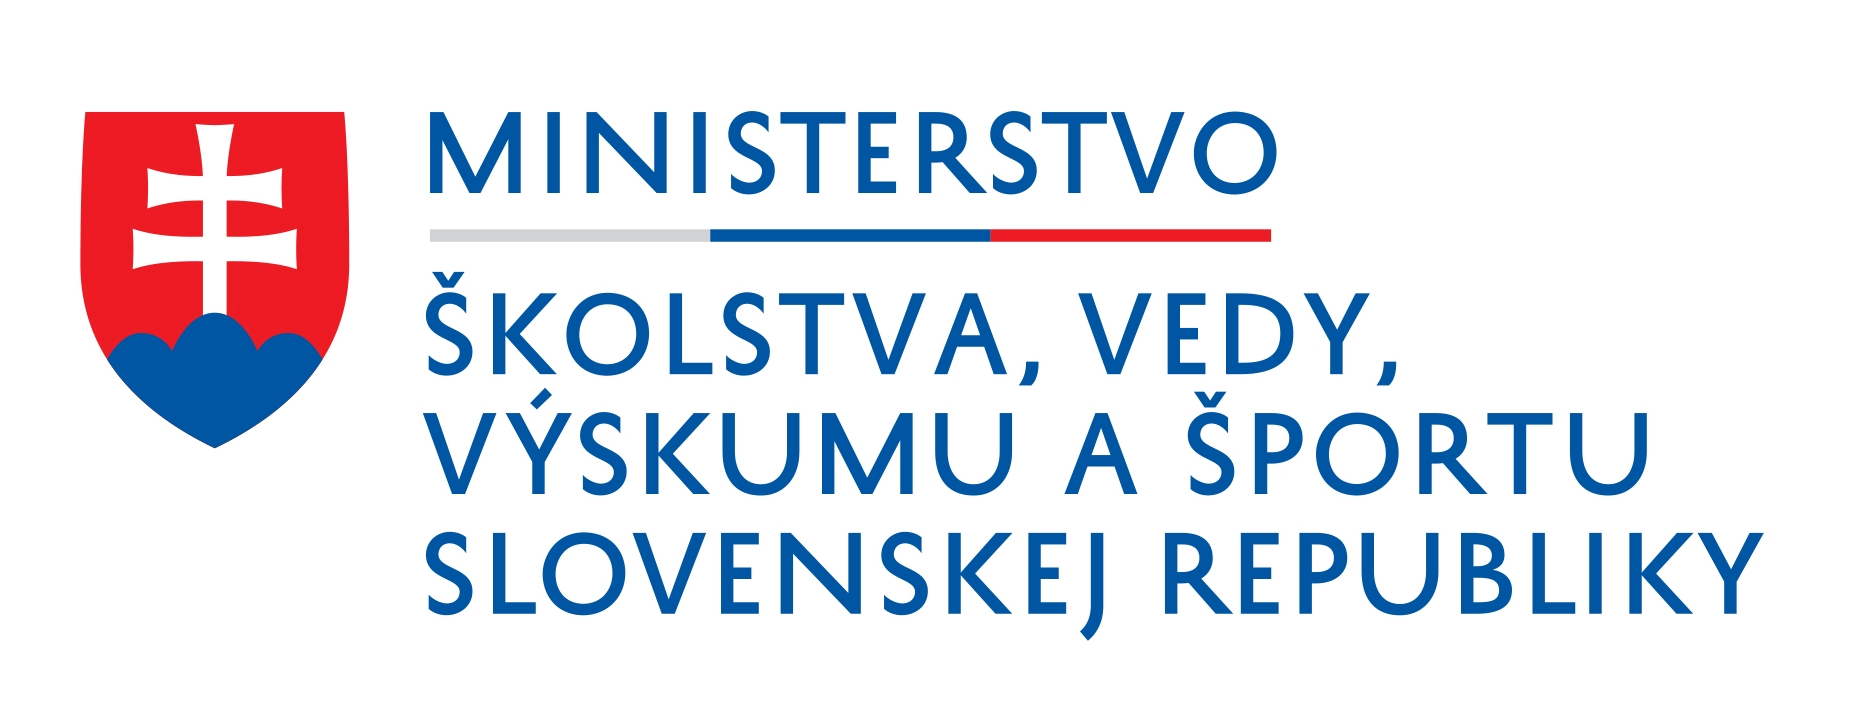 Ministerstvo skolstva, vedy, vyskumu a sportu Slovenskej republiky, partneri, logo, AMAVET